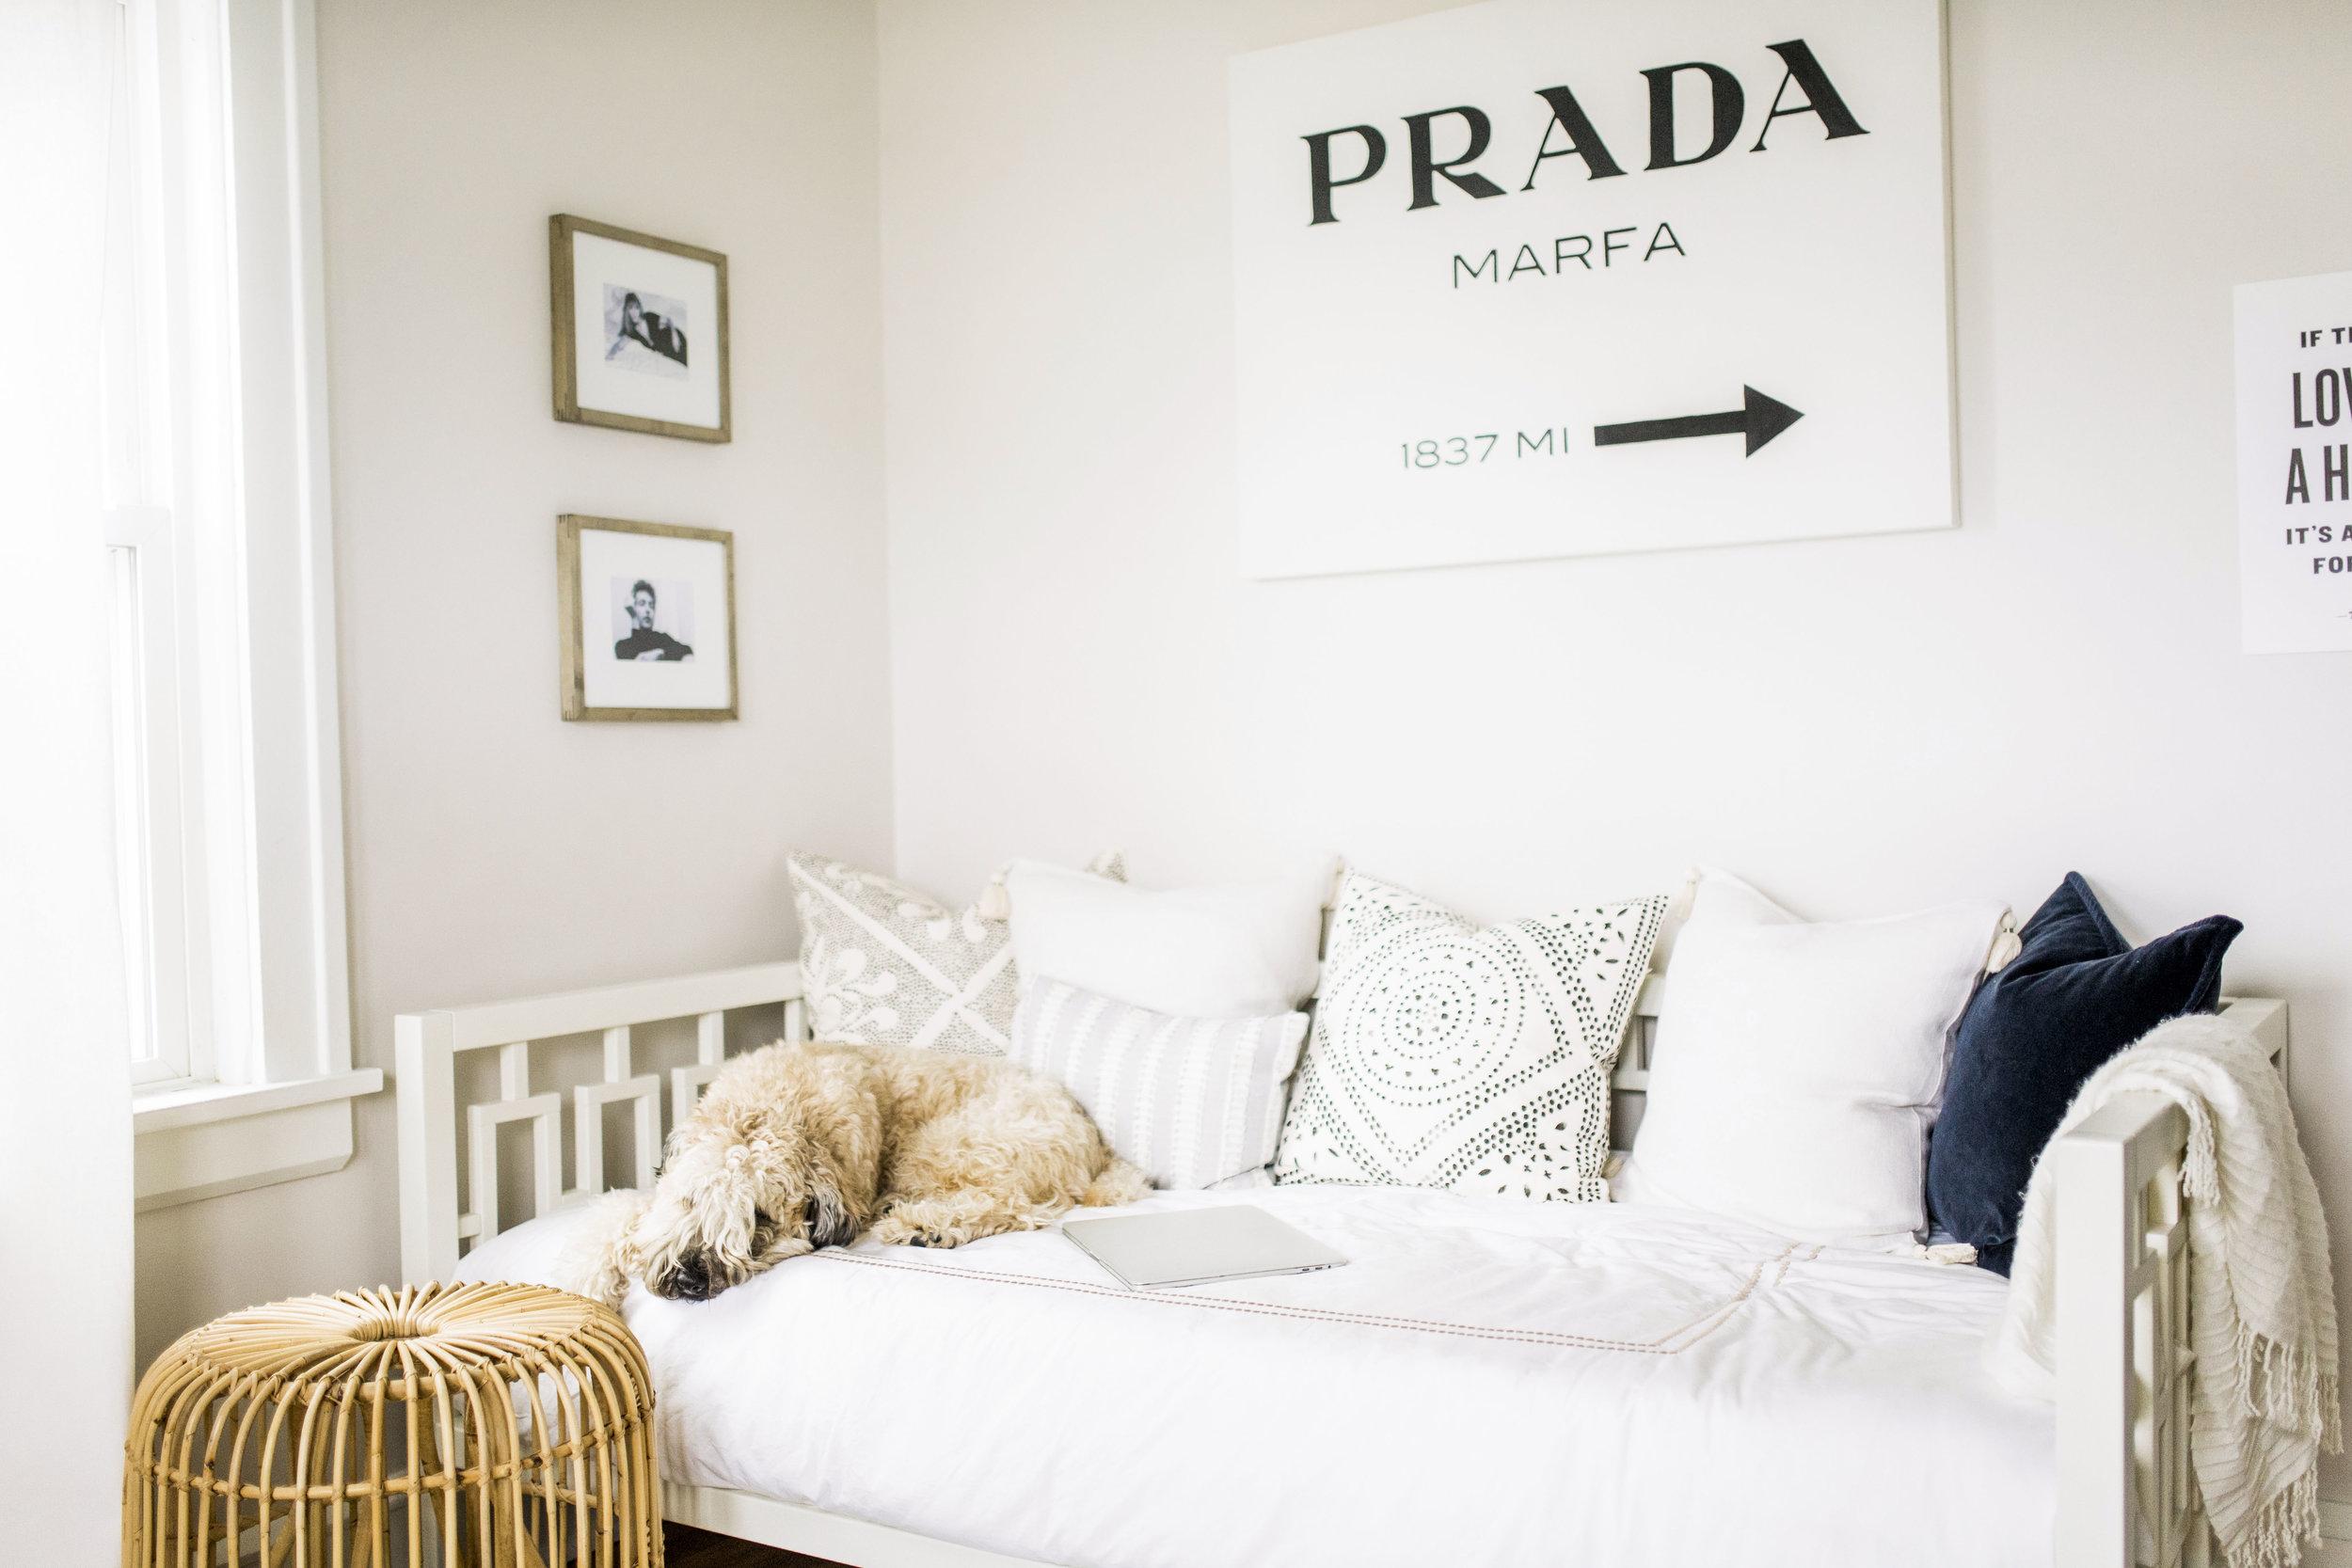 prada-marfa-daybed.jpg